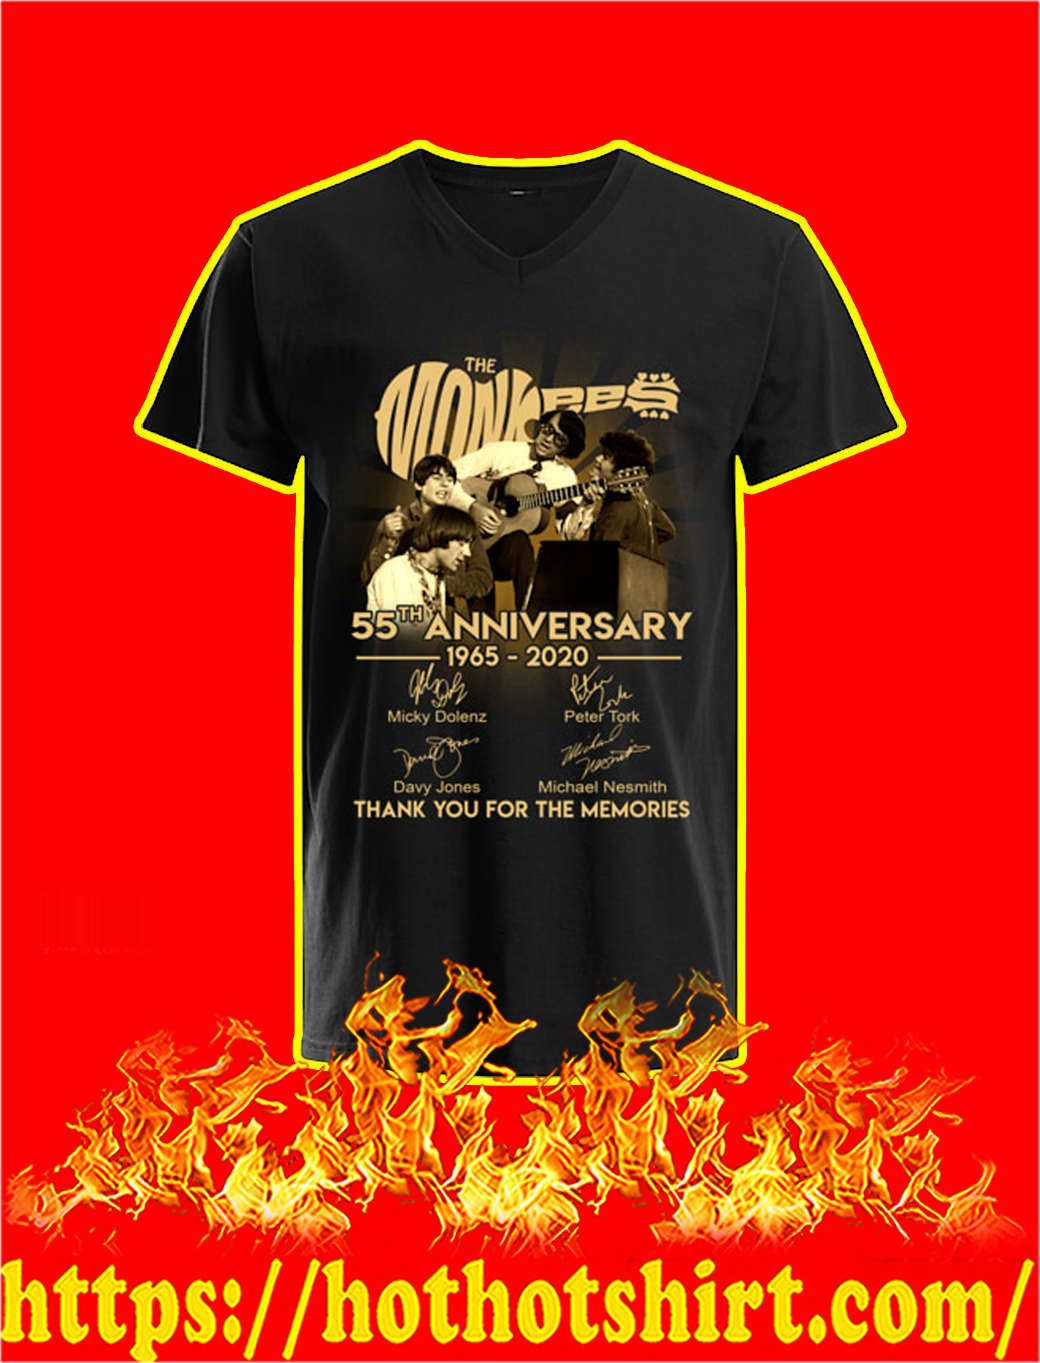 The Monkees 55th Anniversary 1965 2020 v-neck